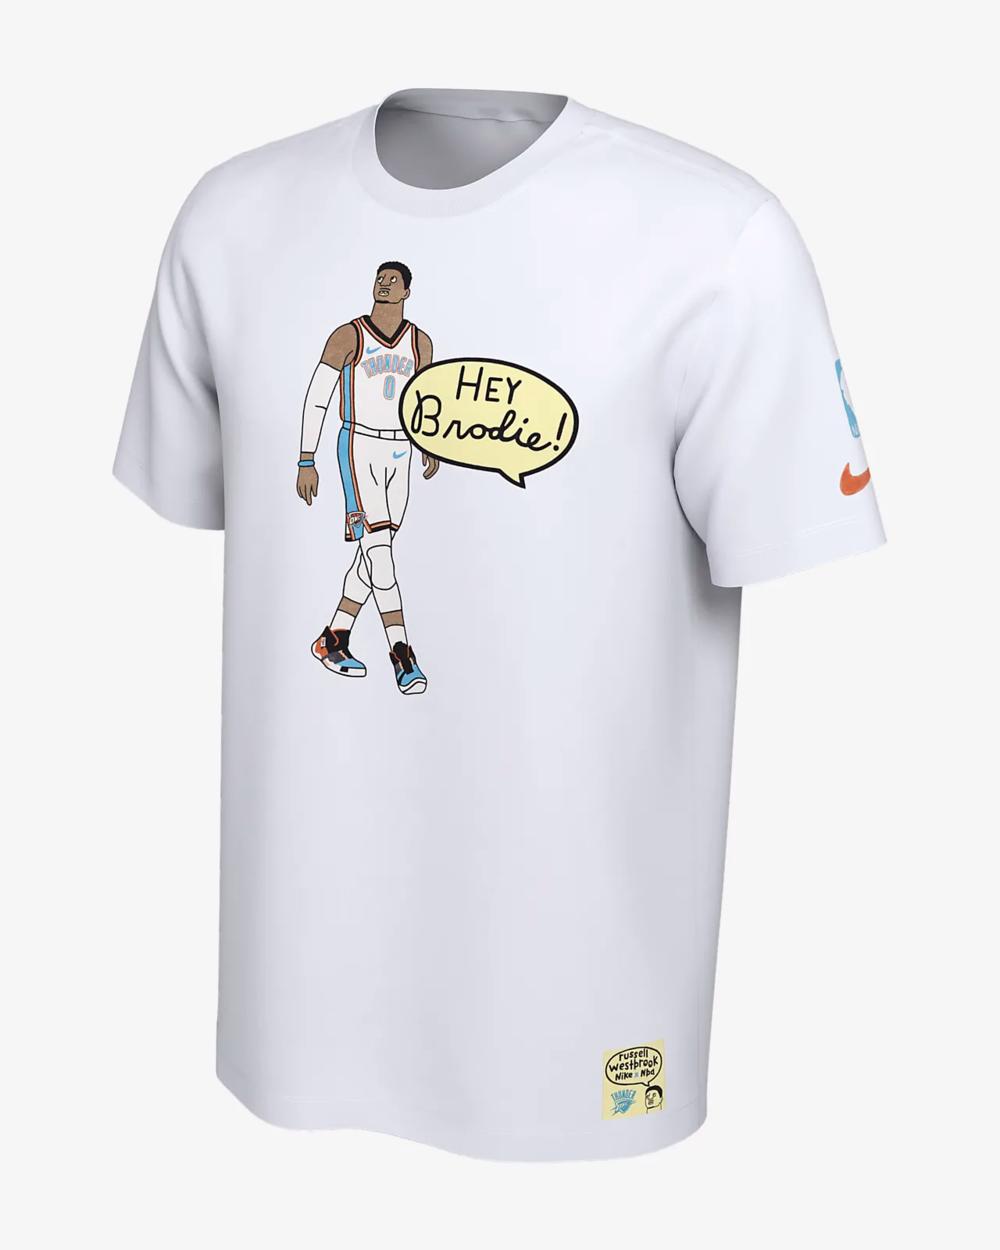 gangster-doodles-hey-brodie-mens-nba-nickname-t-shirt-Mpcwx1.png